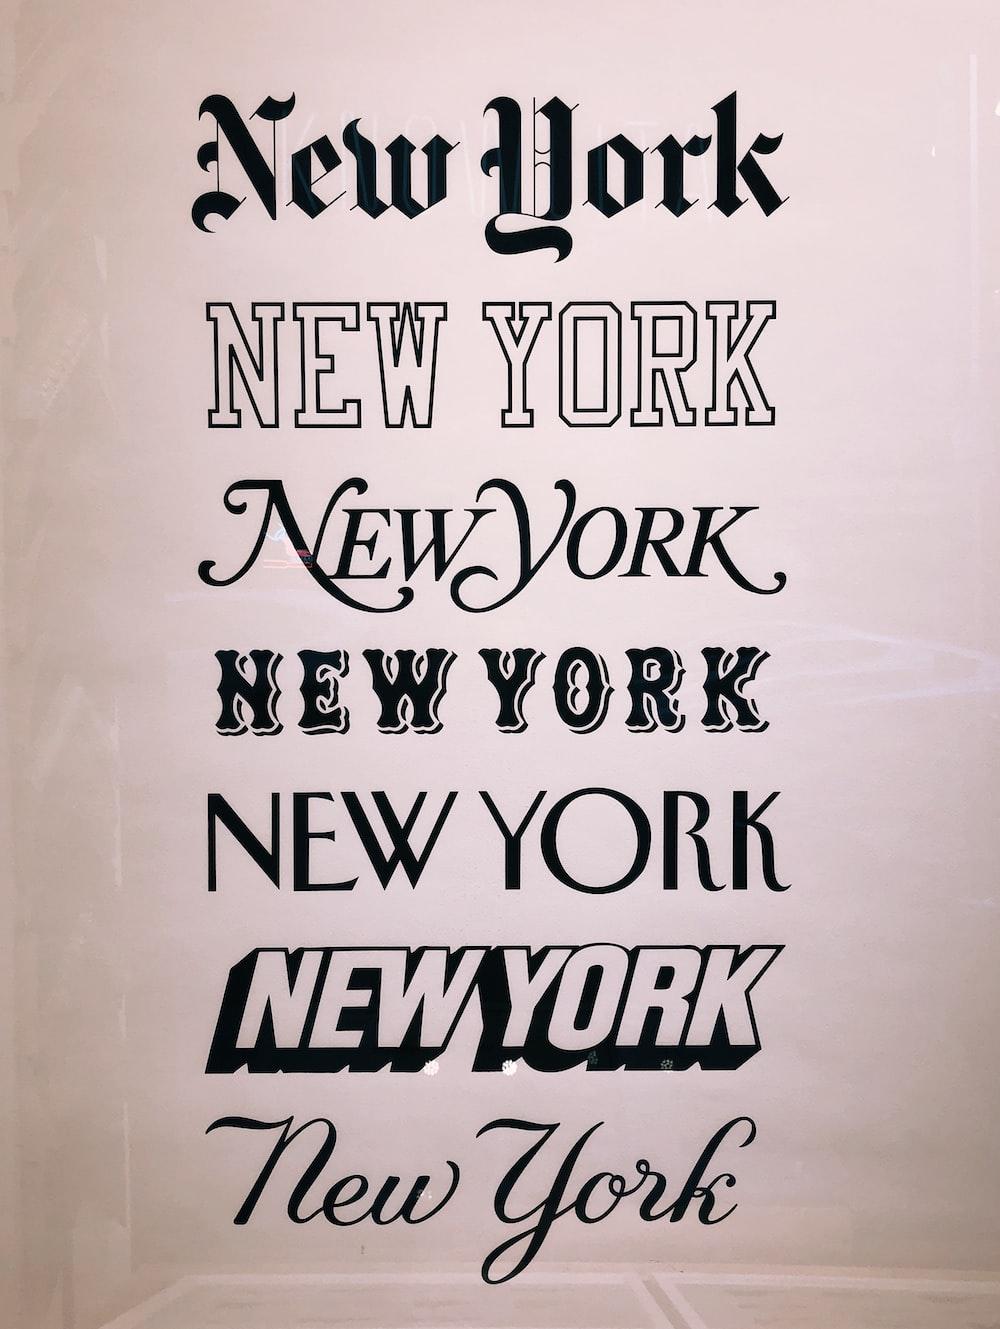 black New York texts